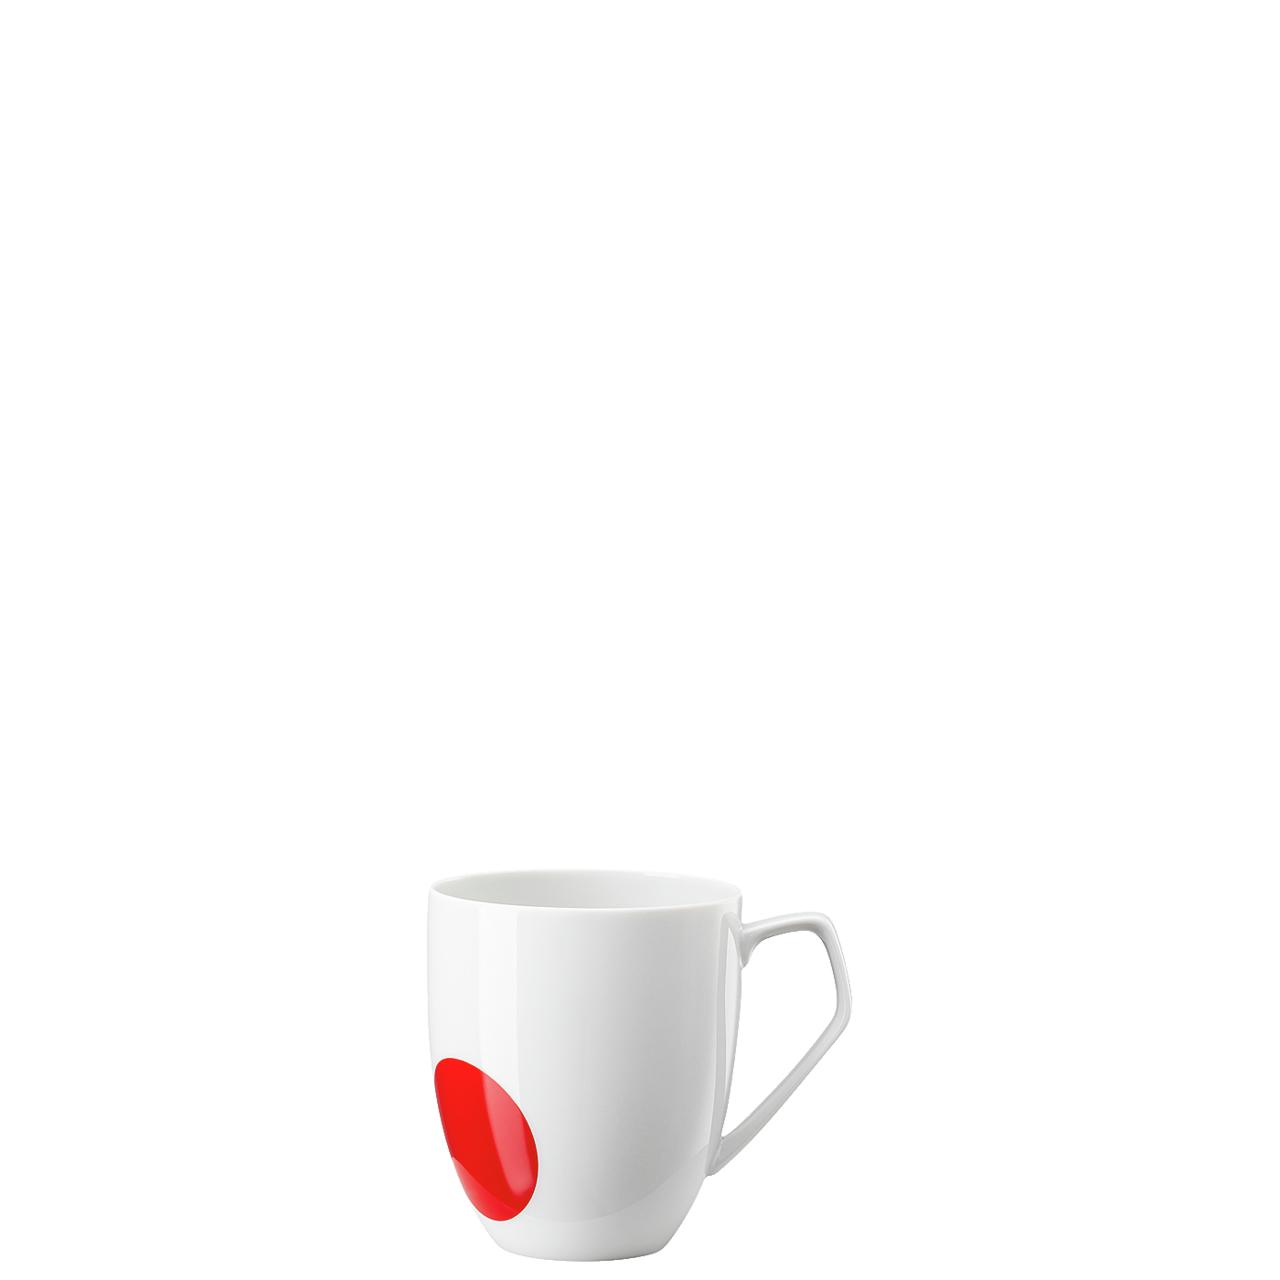 Becher mit Henkel  TAC Gropius Stripes 2.0 Punkt rot Rosenthal Studio Line